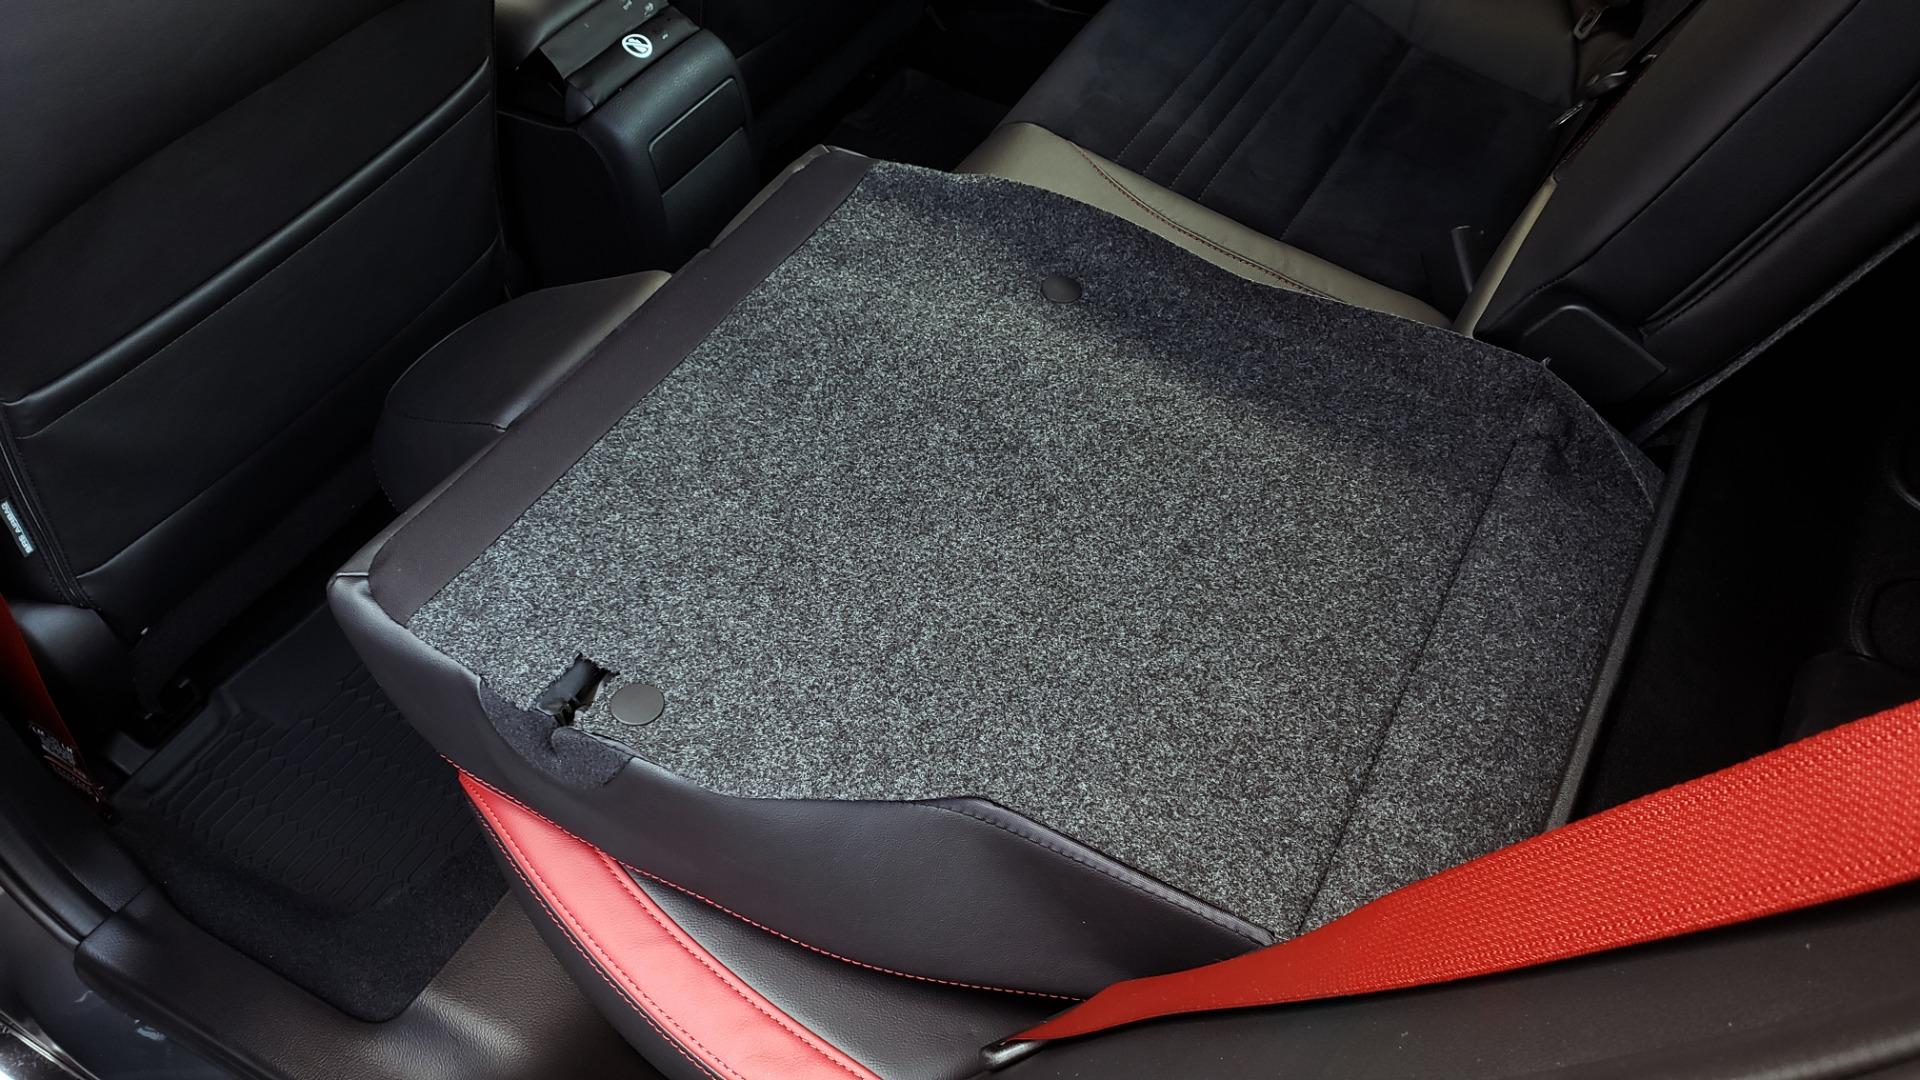 Used 2020 Subaru WRX STI 2.5L TURBO / 6-SPEED MANUAL / RECARO SEATS / REARVIEW for sale Sold at Formula Imports in Charlotte NC 28227 73